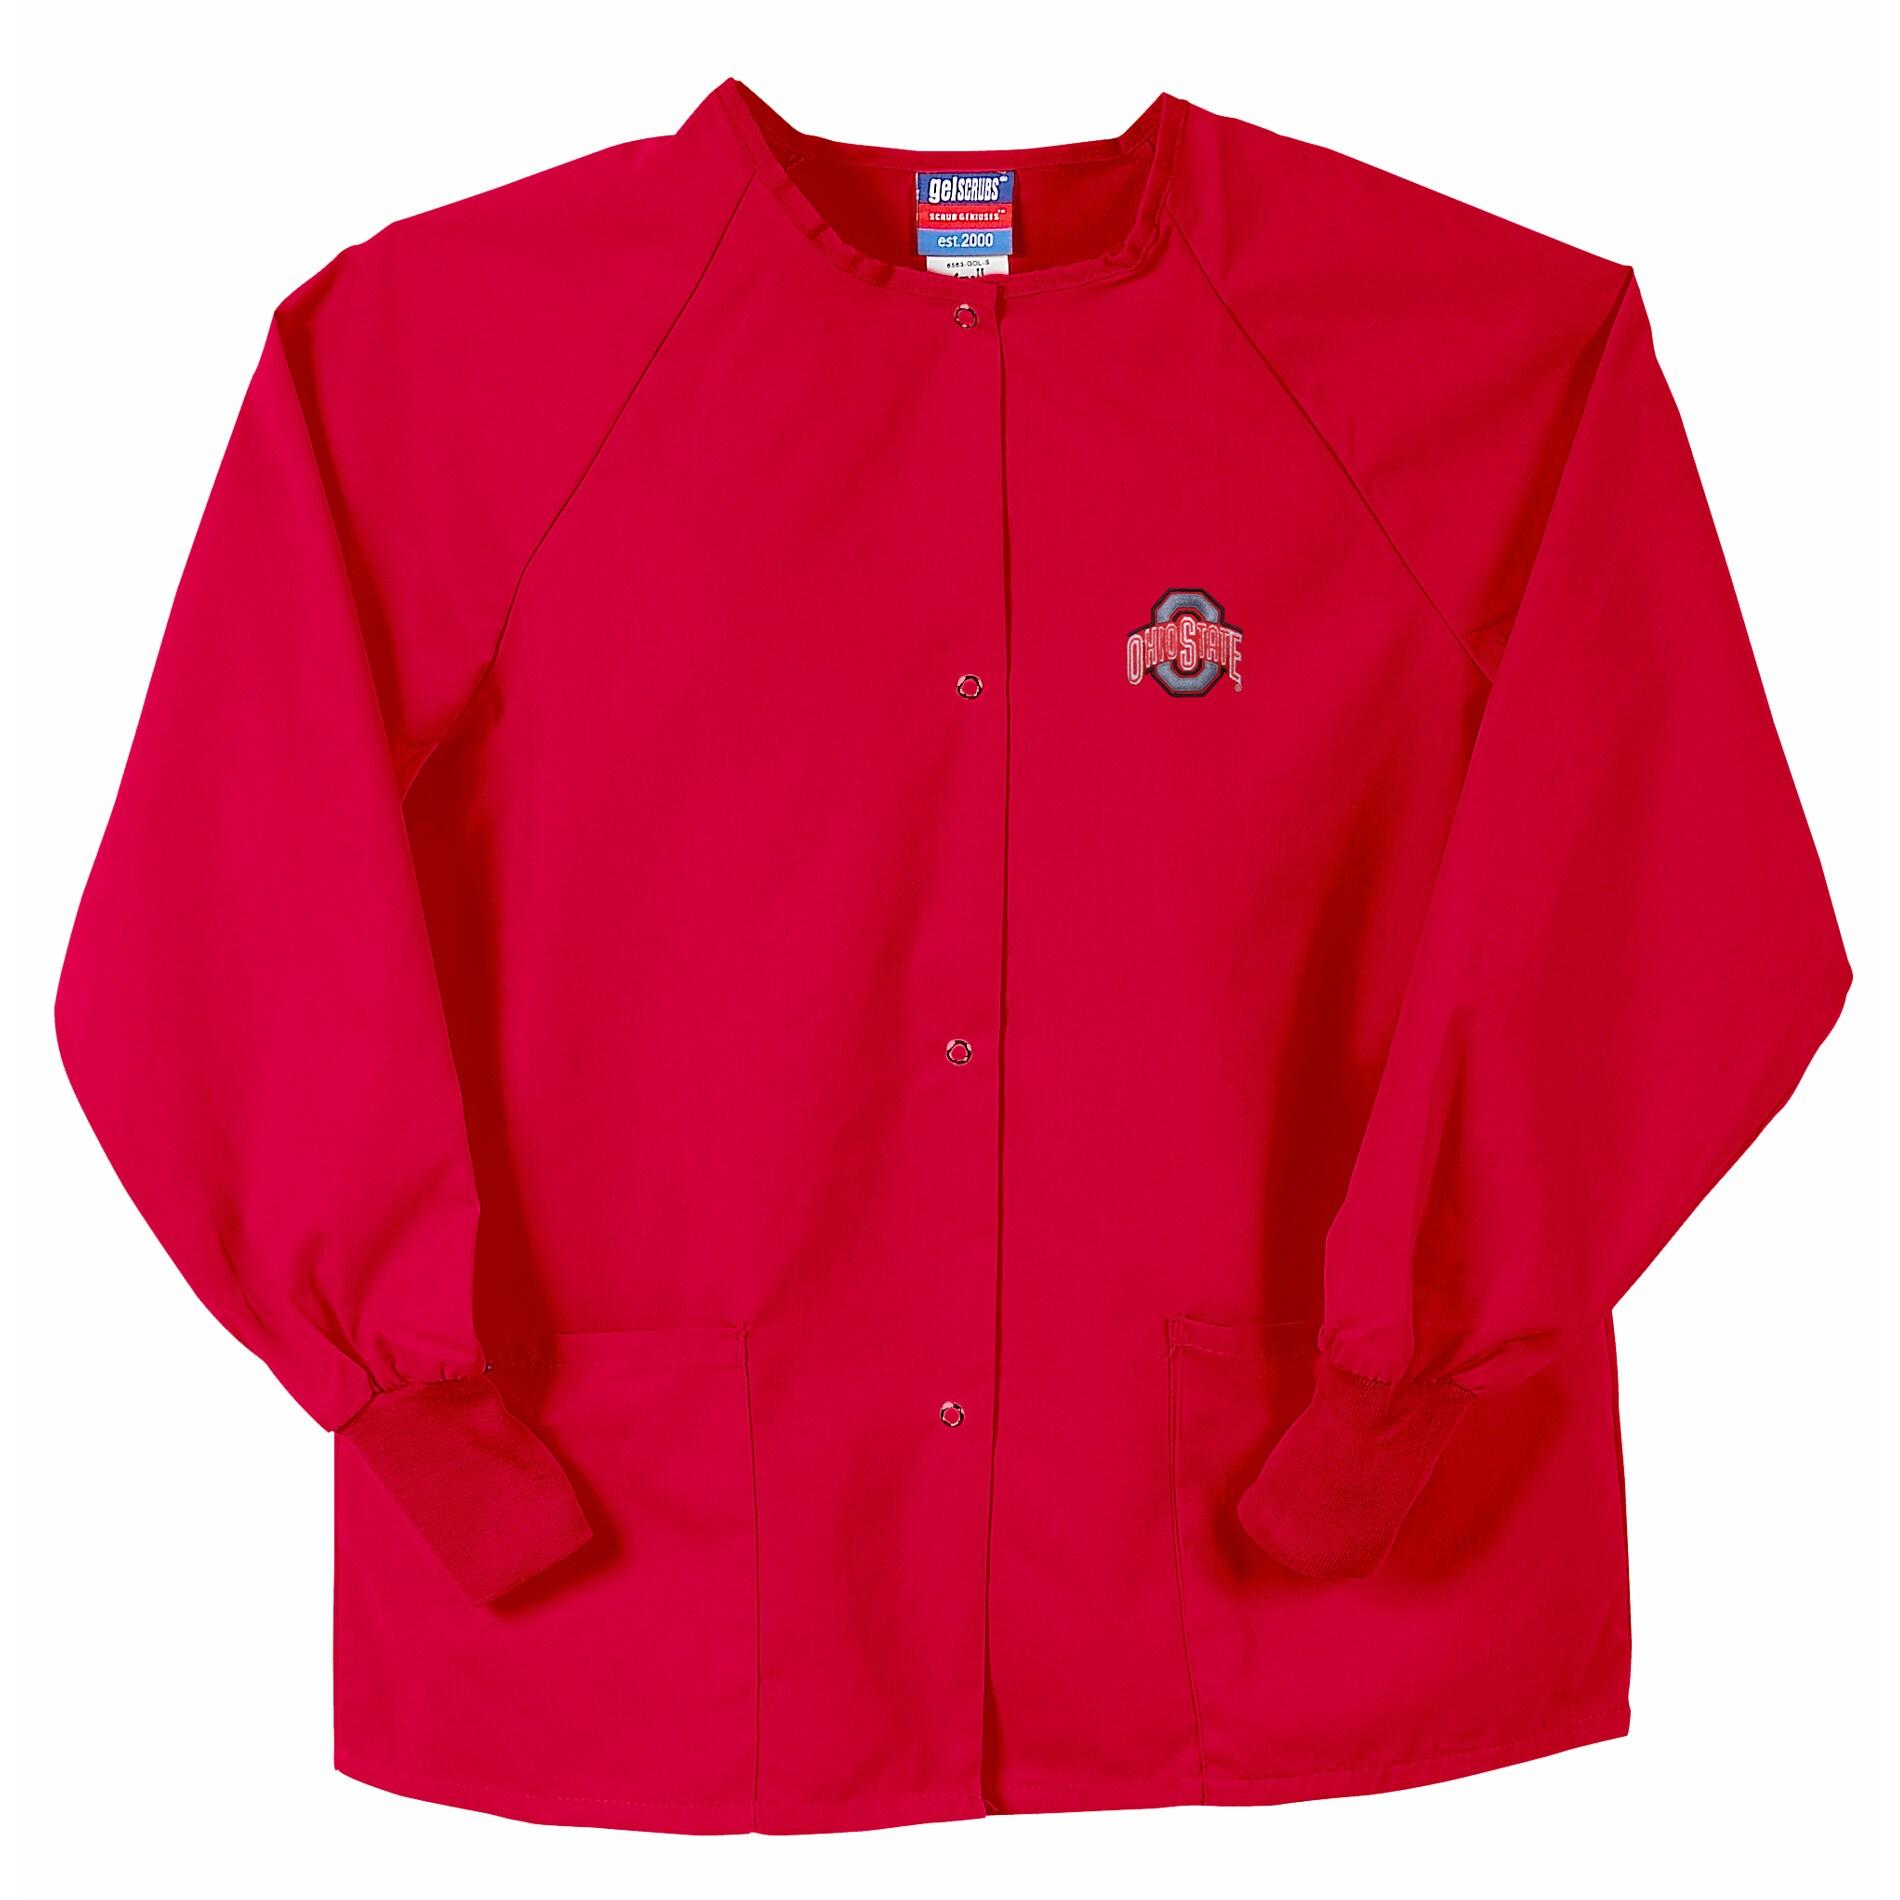 Gelscrubs Unisex Red Ohio State Buckeyes Nurse Jacket